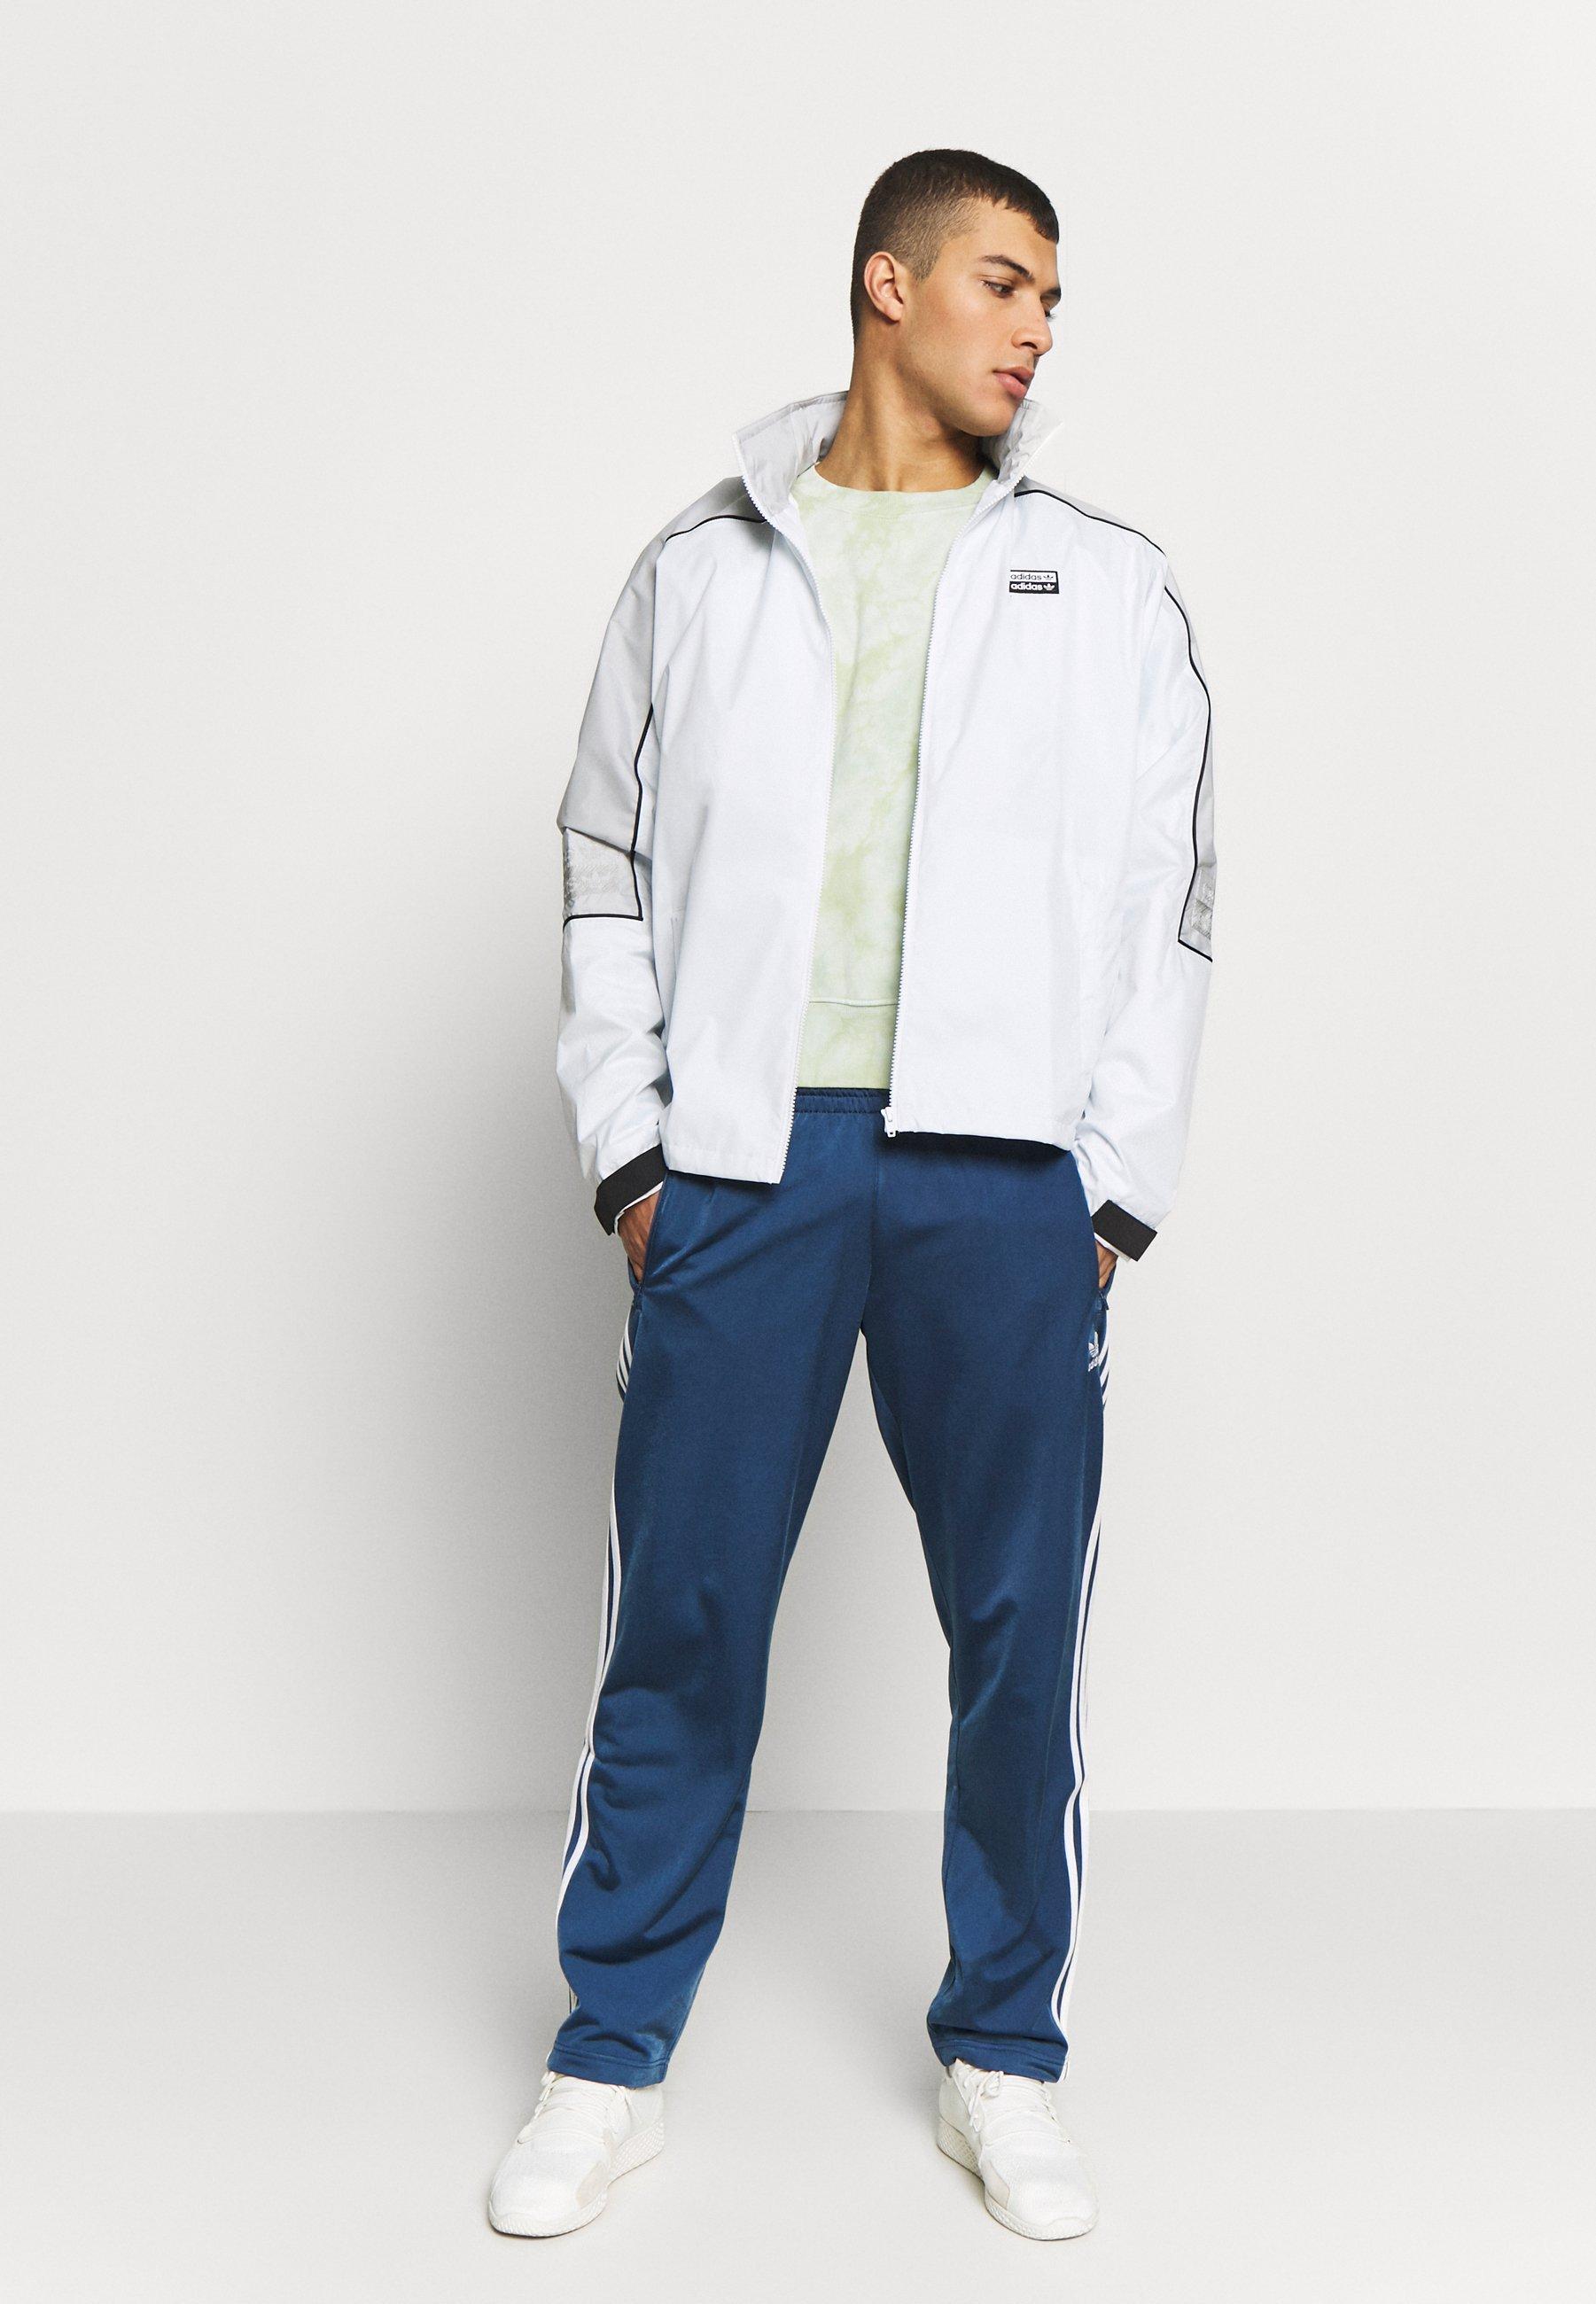 adidas Originals R.Y.V. SPORT INSPIRED TRACK TOP JACKET